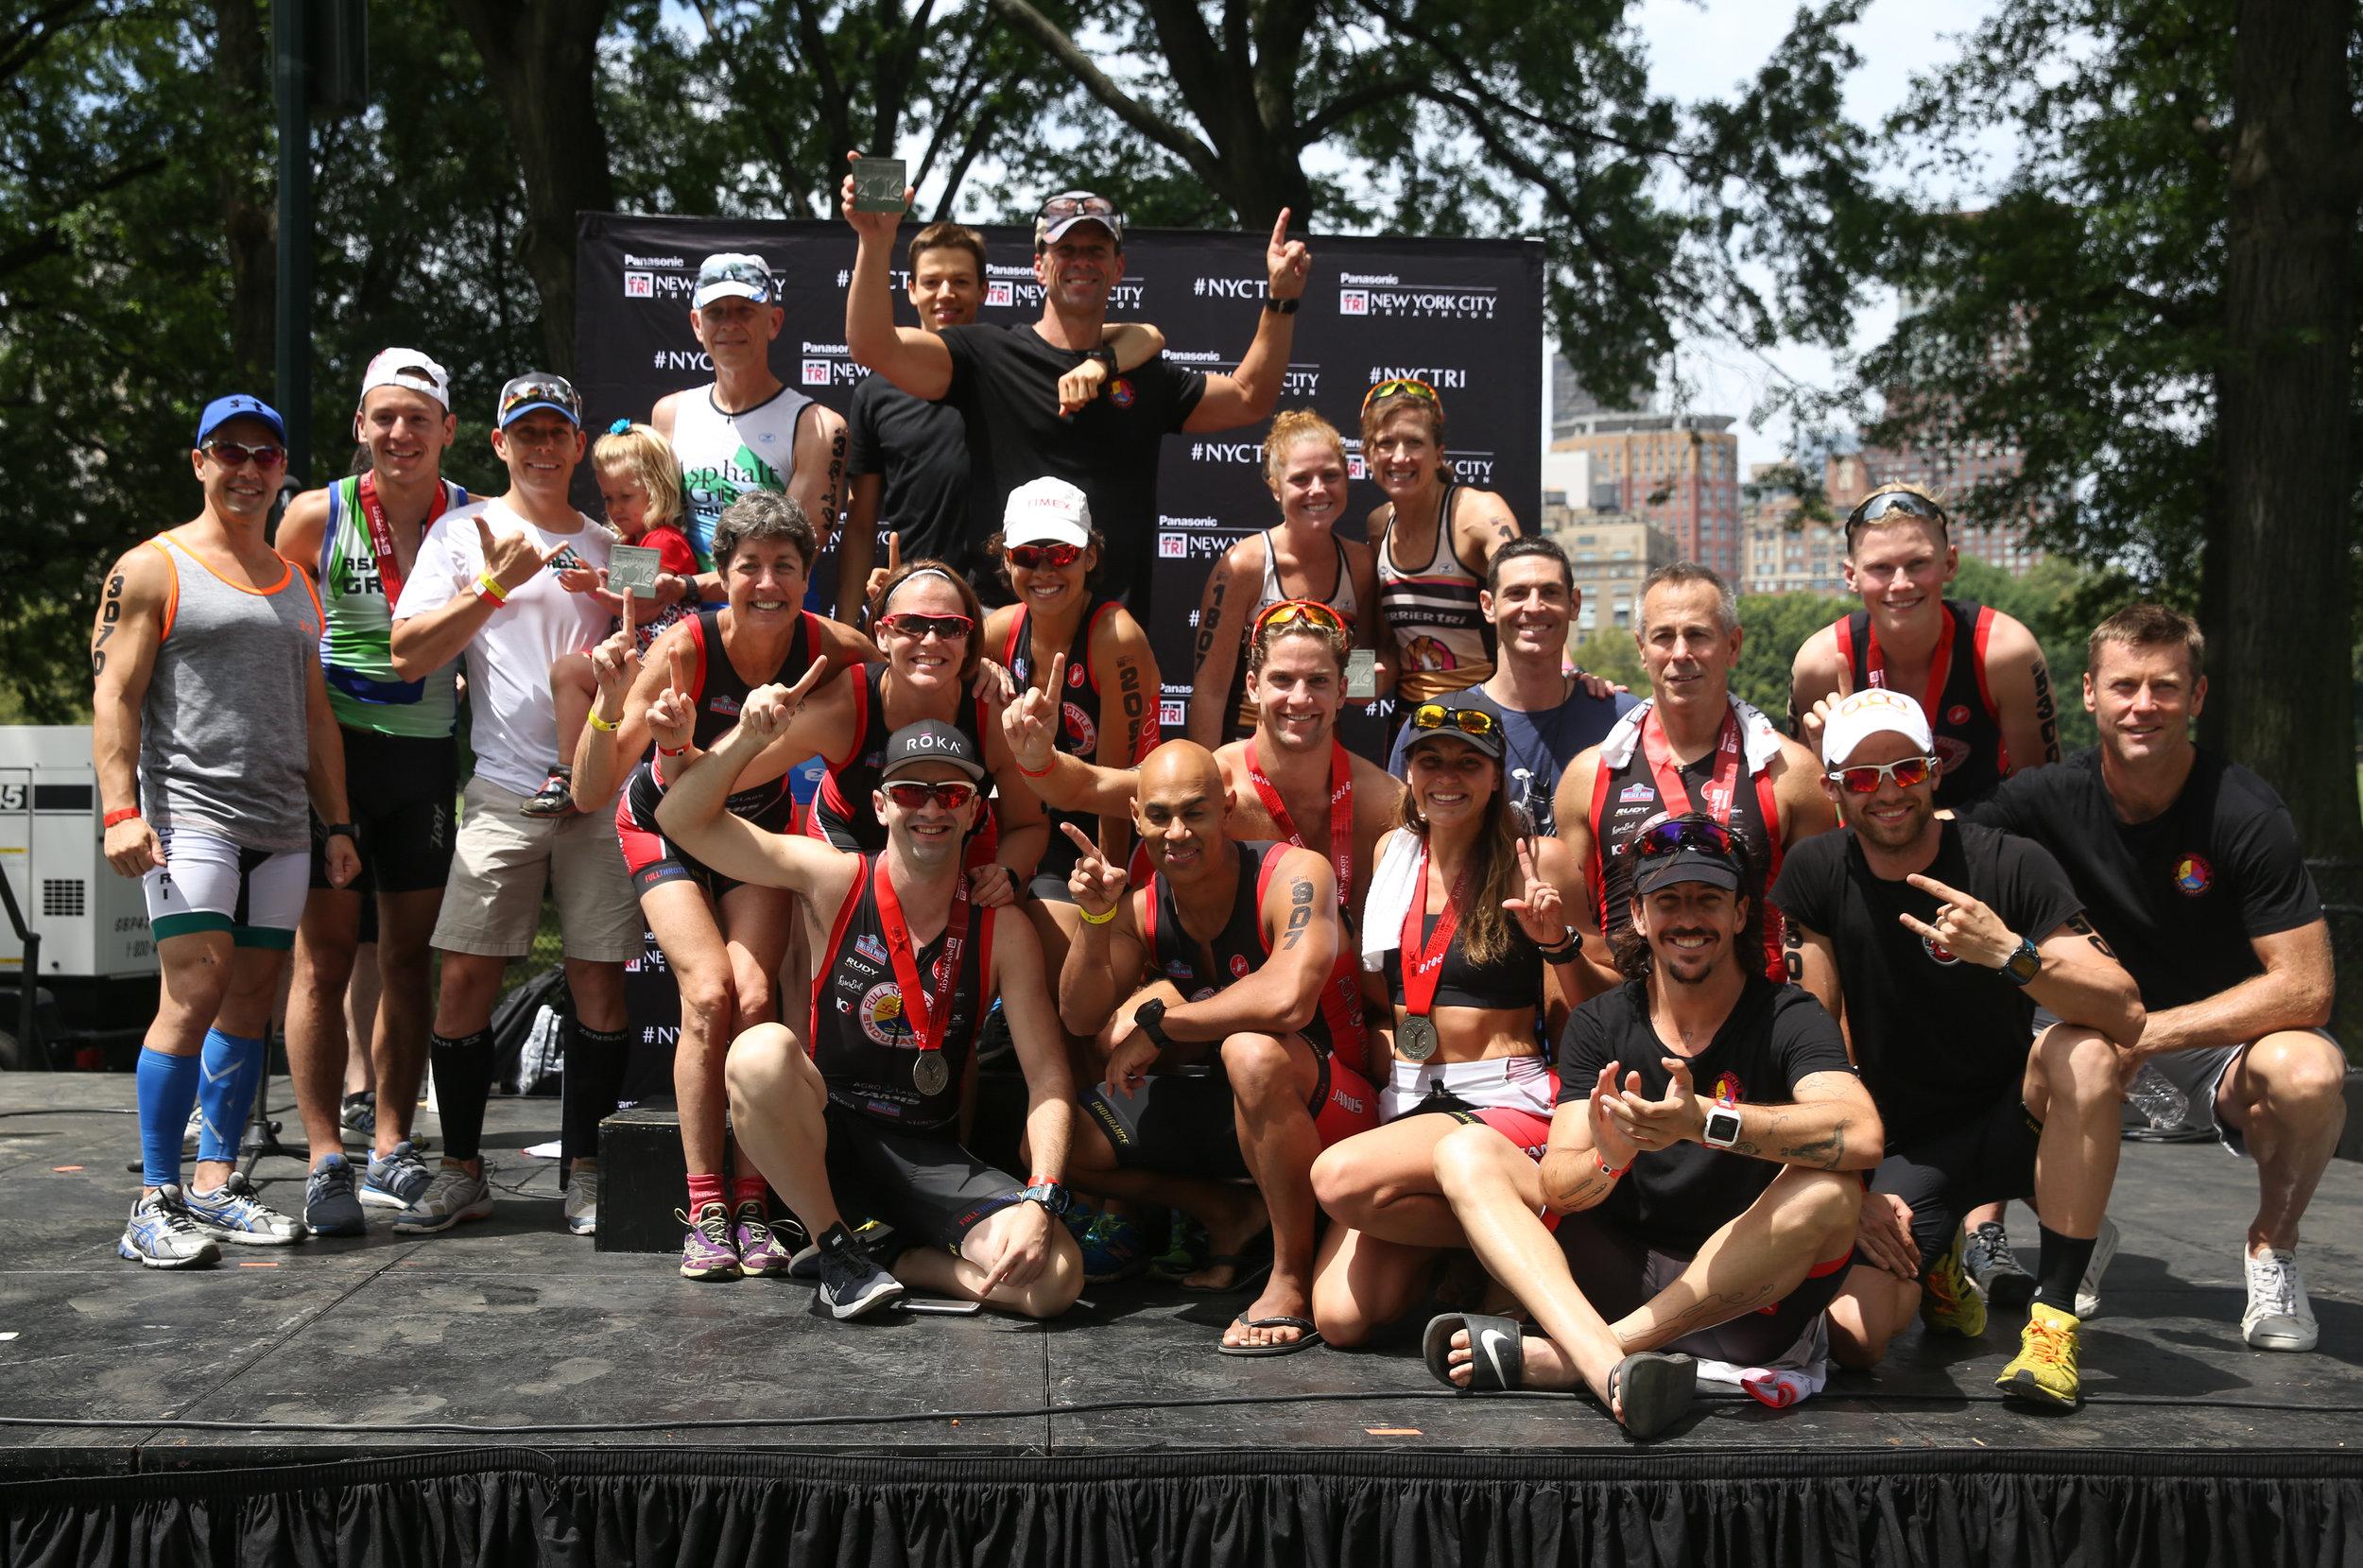 Your 2016 New York City Triathlon Team Champions